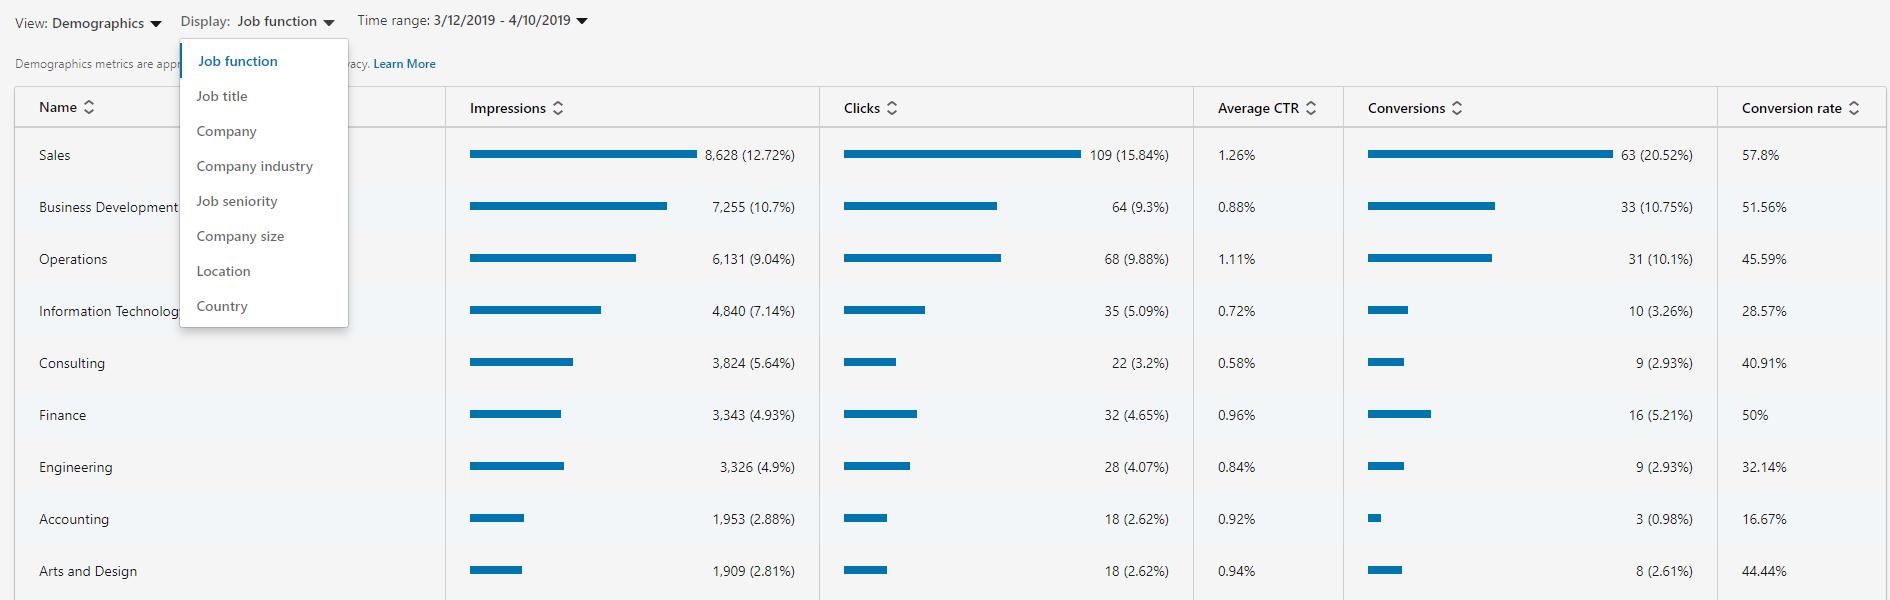 LinkedIn analytics and performance data